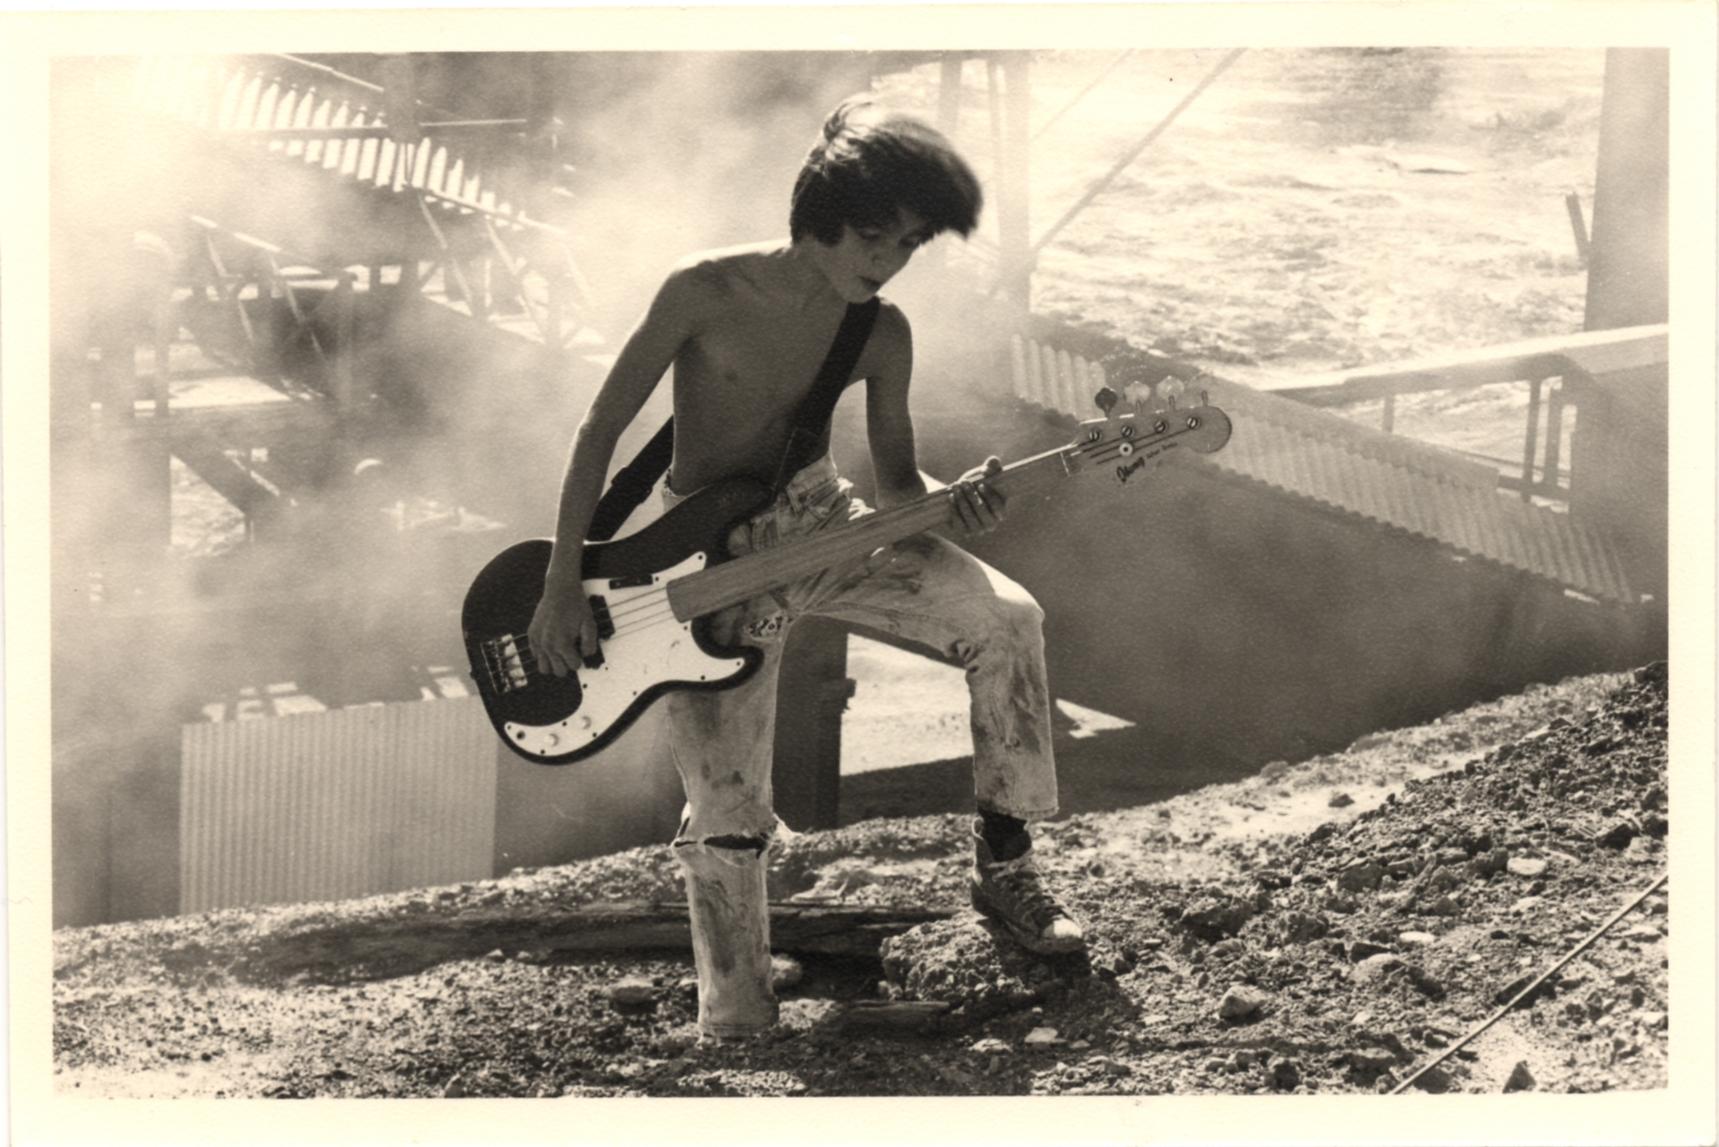 1993 videoclip jogo do empurra